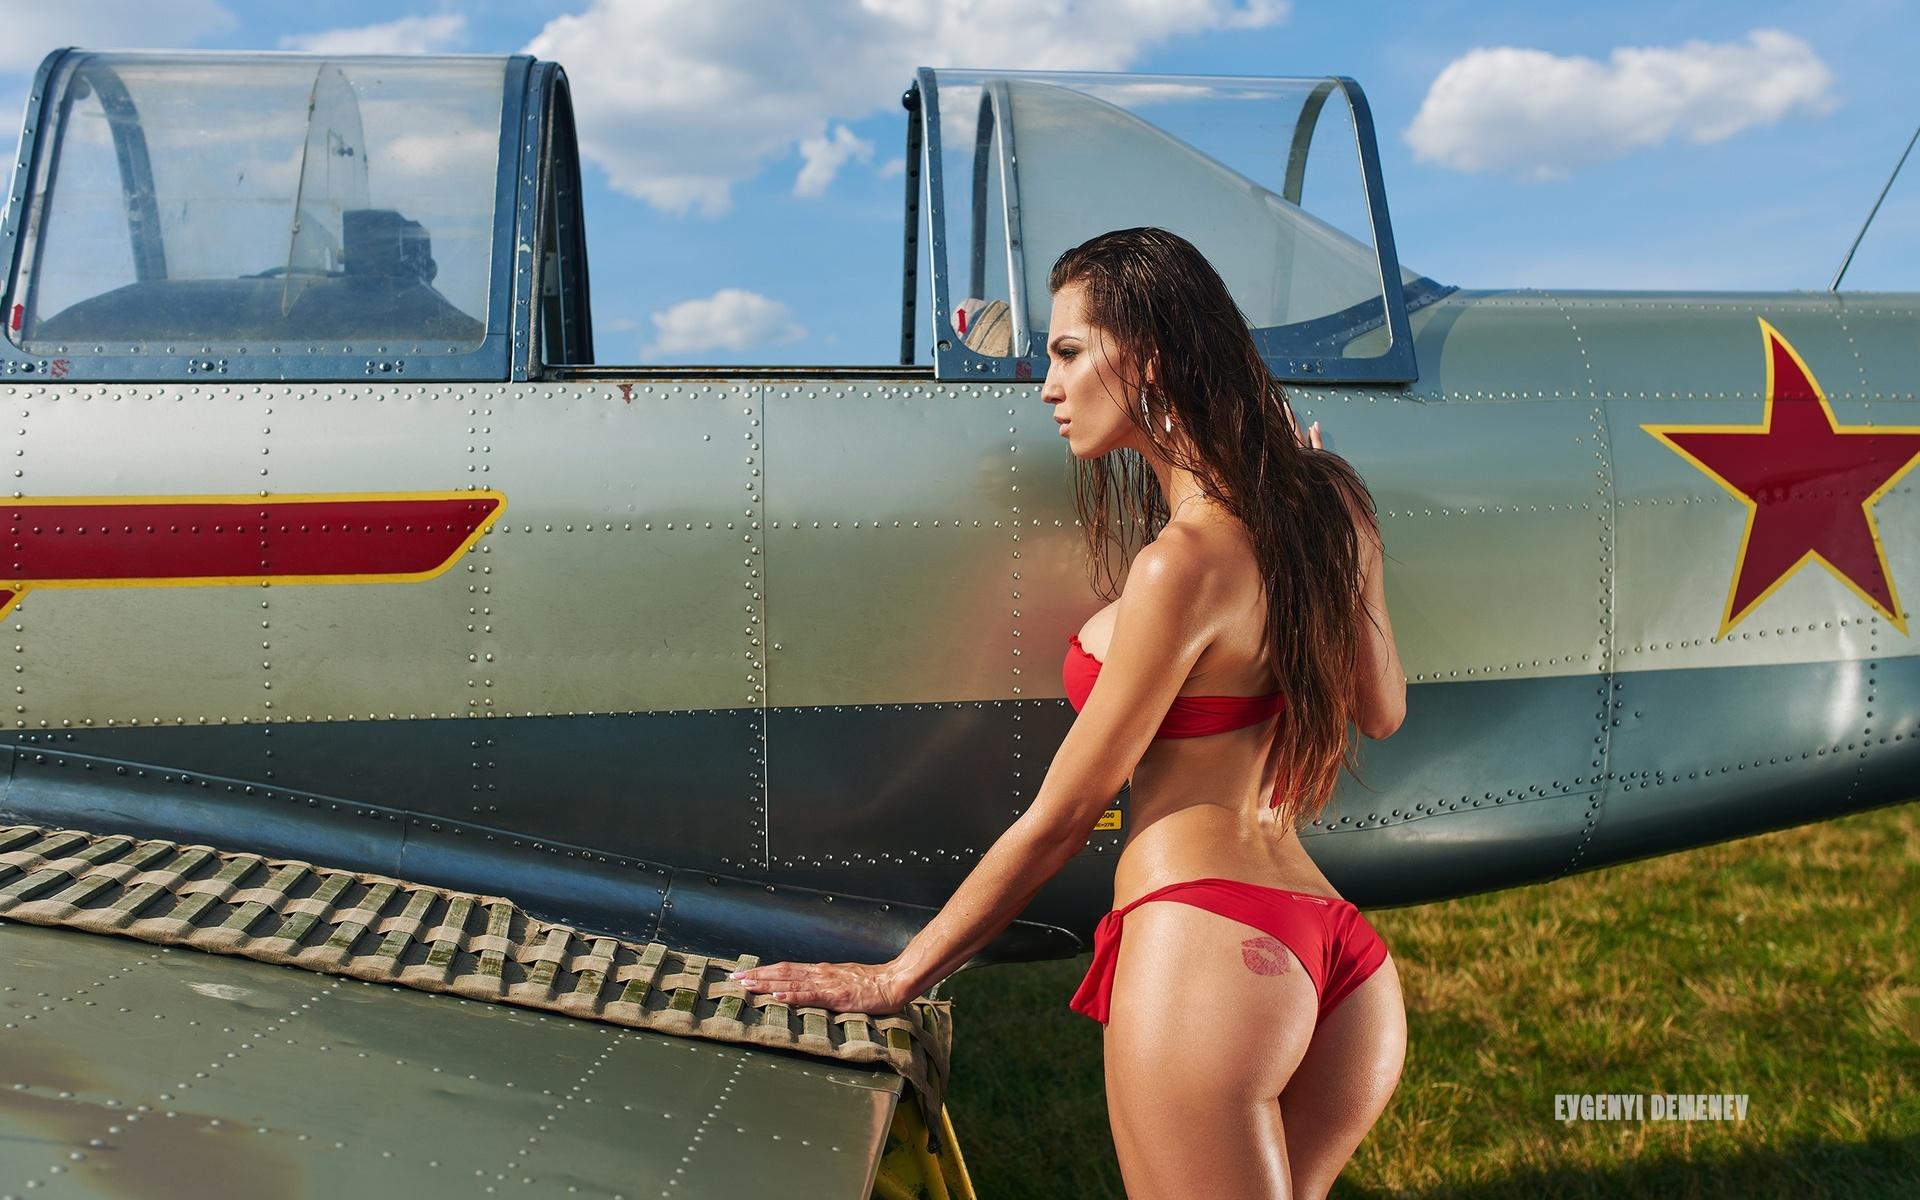 women, planes, airplane, tanned, evgenyi demenev, women outdoors, ass, red bikini, tattoo, long hair, grass